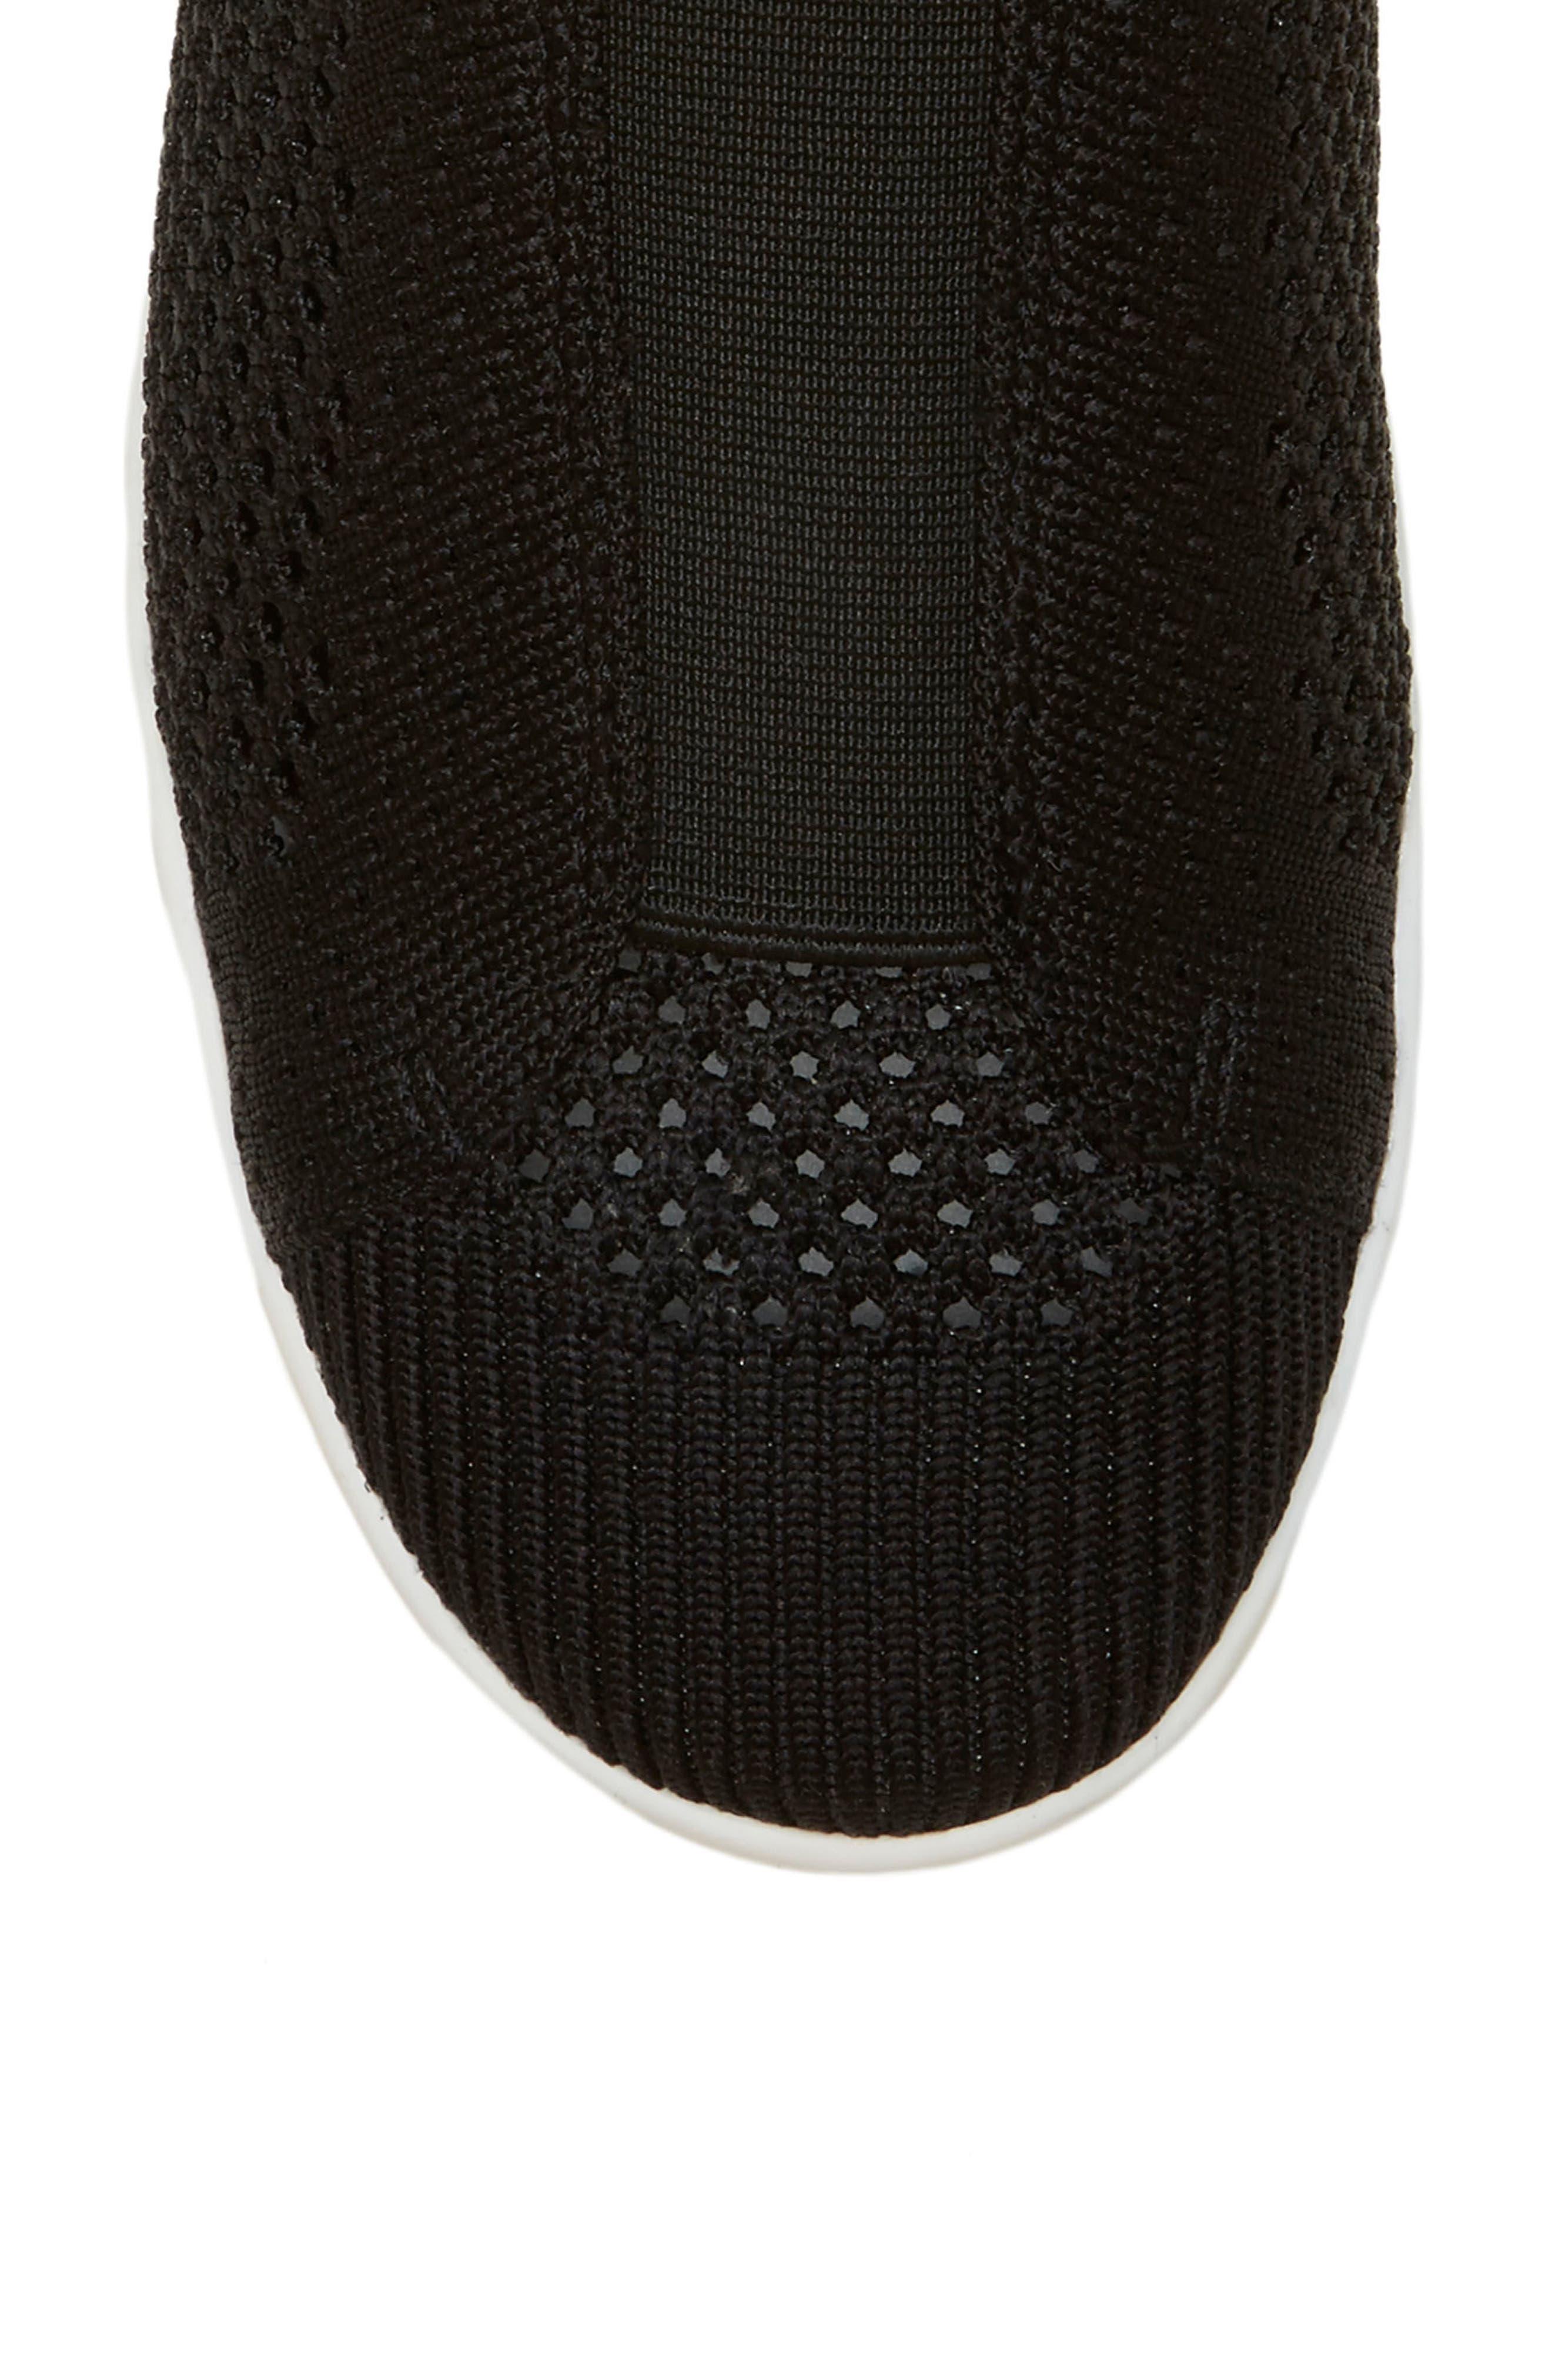 Casbey Slip-On Sneaker,                             Alternate thumbnail 5, color,                             BLACK/ BLACK FABRIC